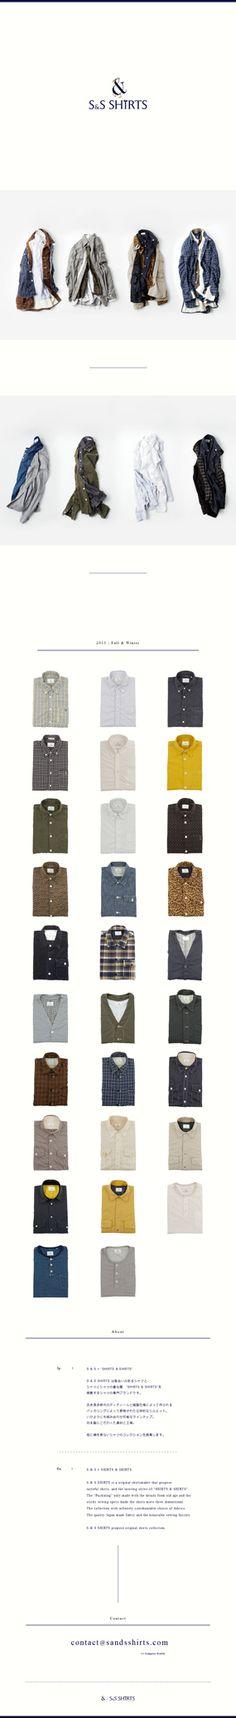 S Shirts | 縦長のwebデザインギャラリー・サイトリンク集|MUUUUU_CHANG Web DESIGN Showcase